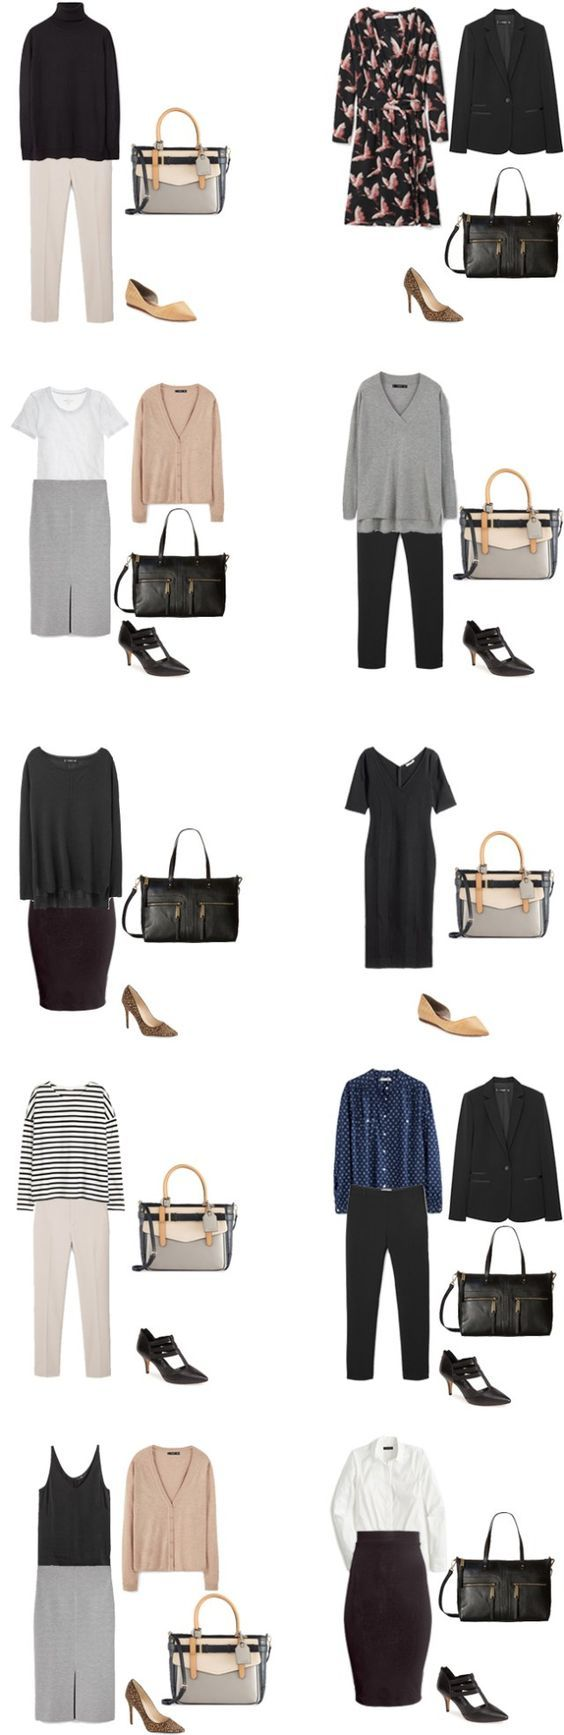 Basic Work Capsule Outfits 11-20 #capsulewardrobe #workwardrobe #workwear #capsule: